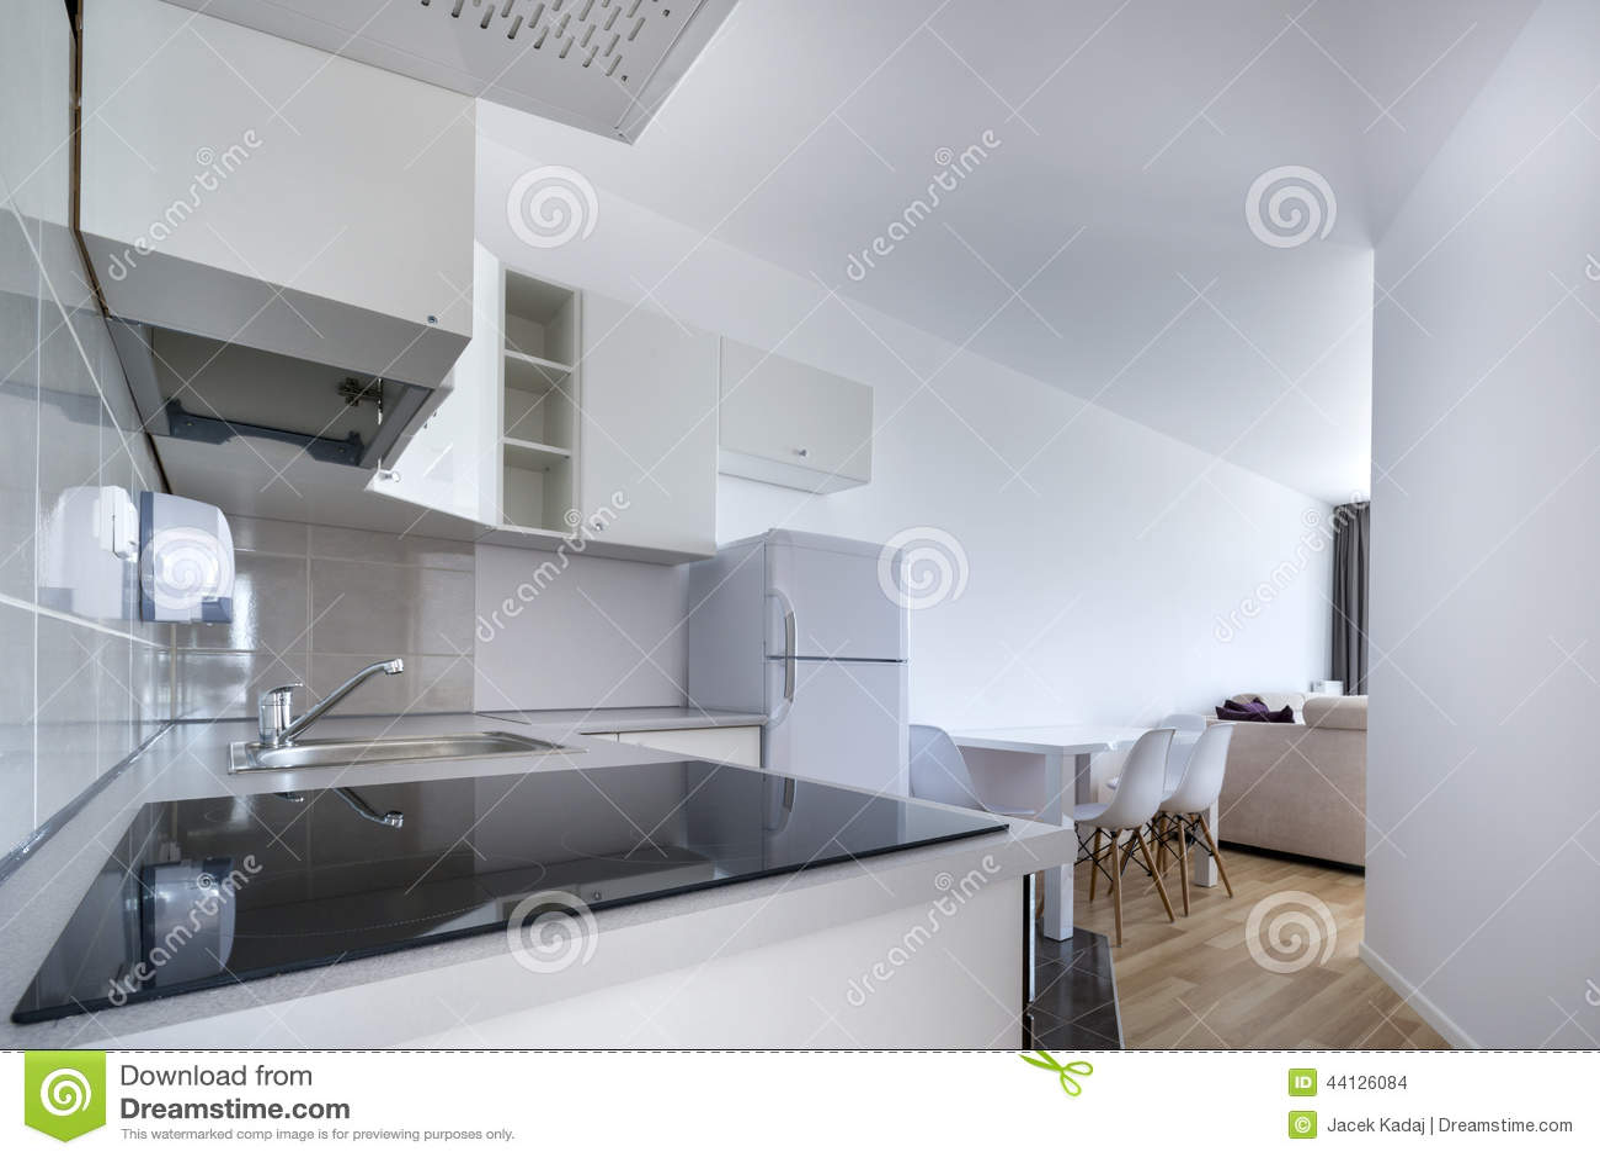 modern, white compact kitchen interior design stock photo - image